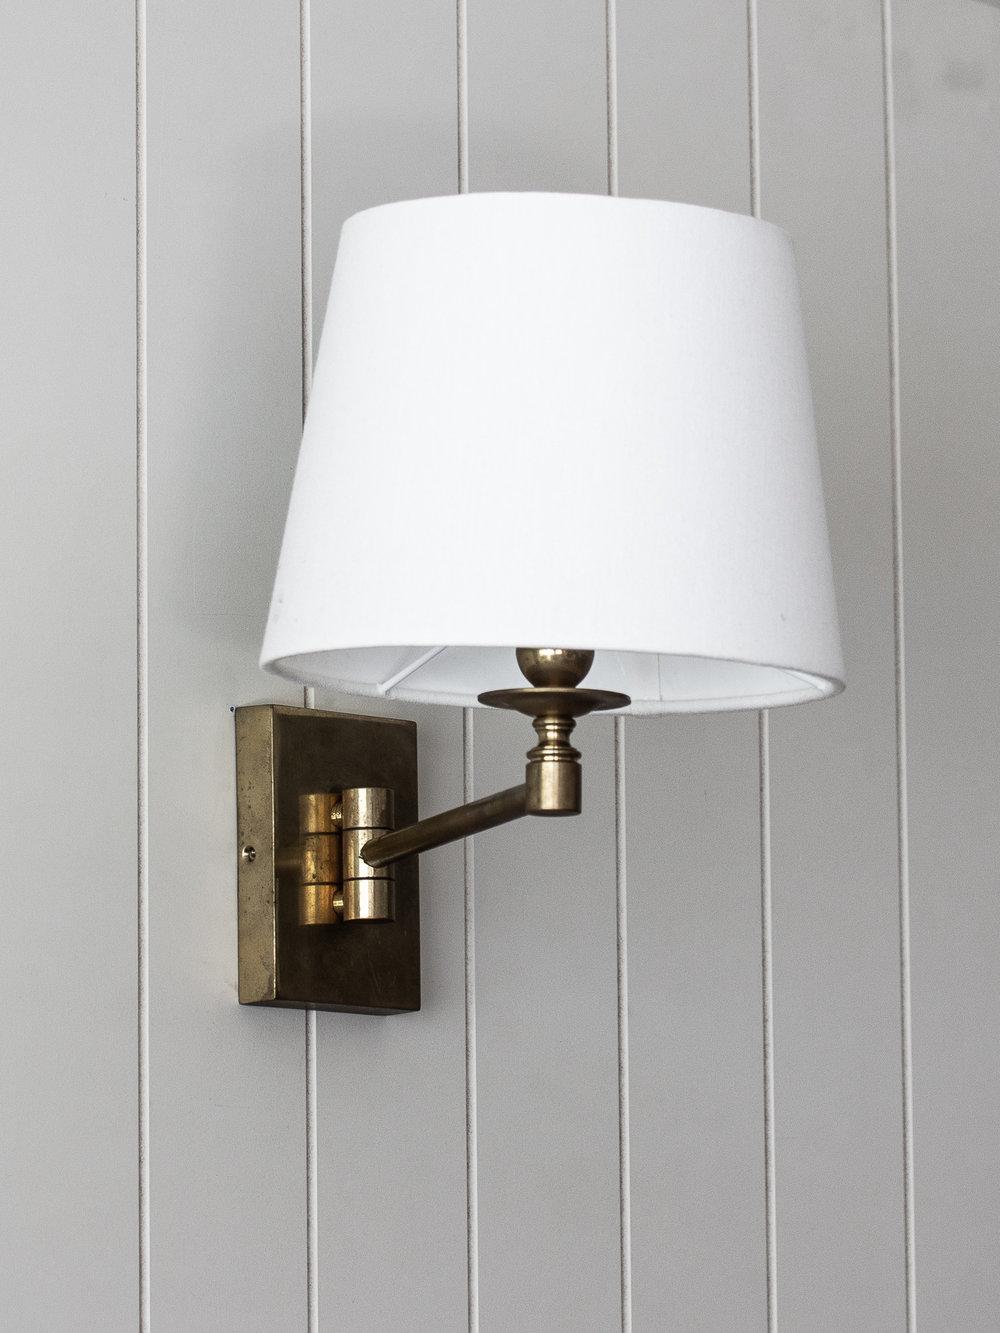 The Bancroft Swing Arm Wall Lamp